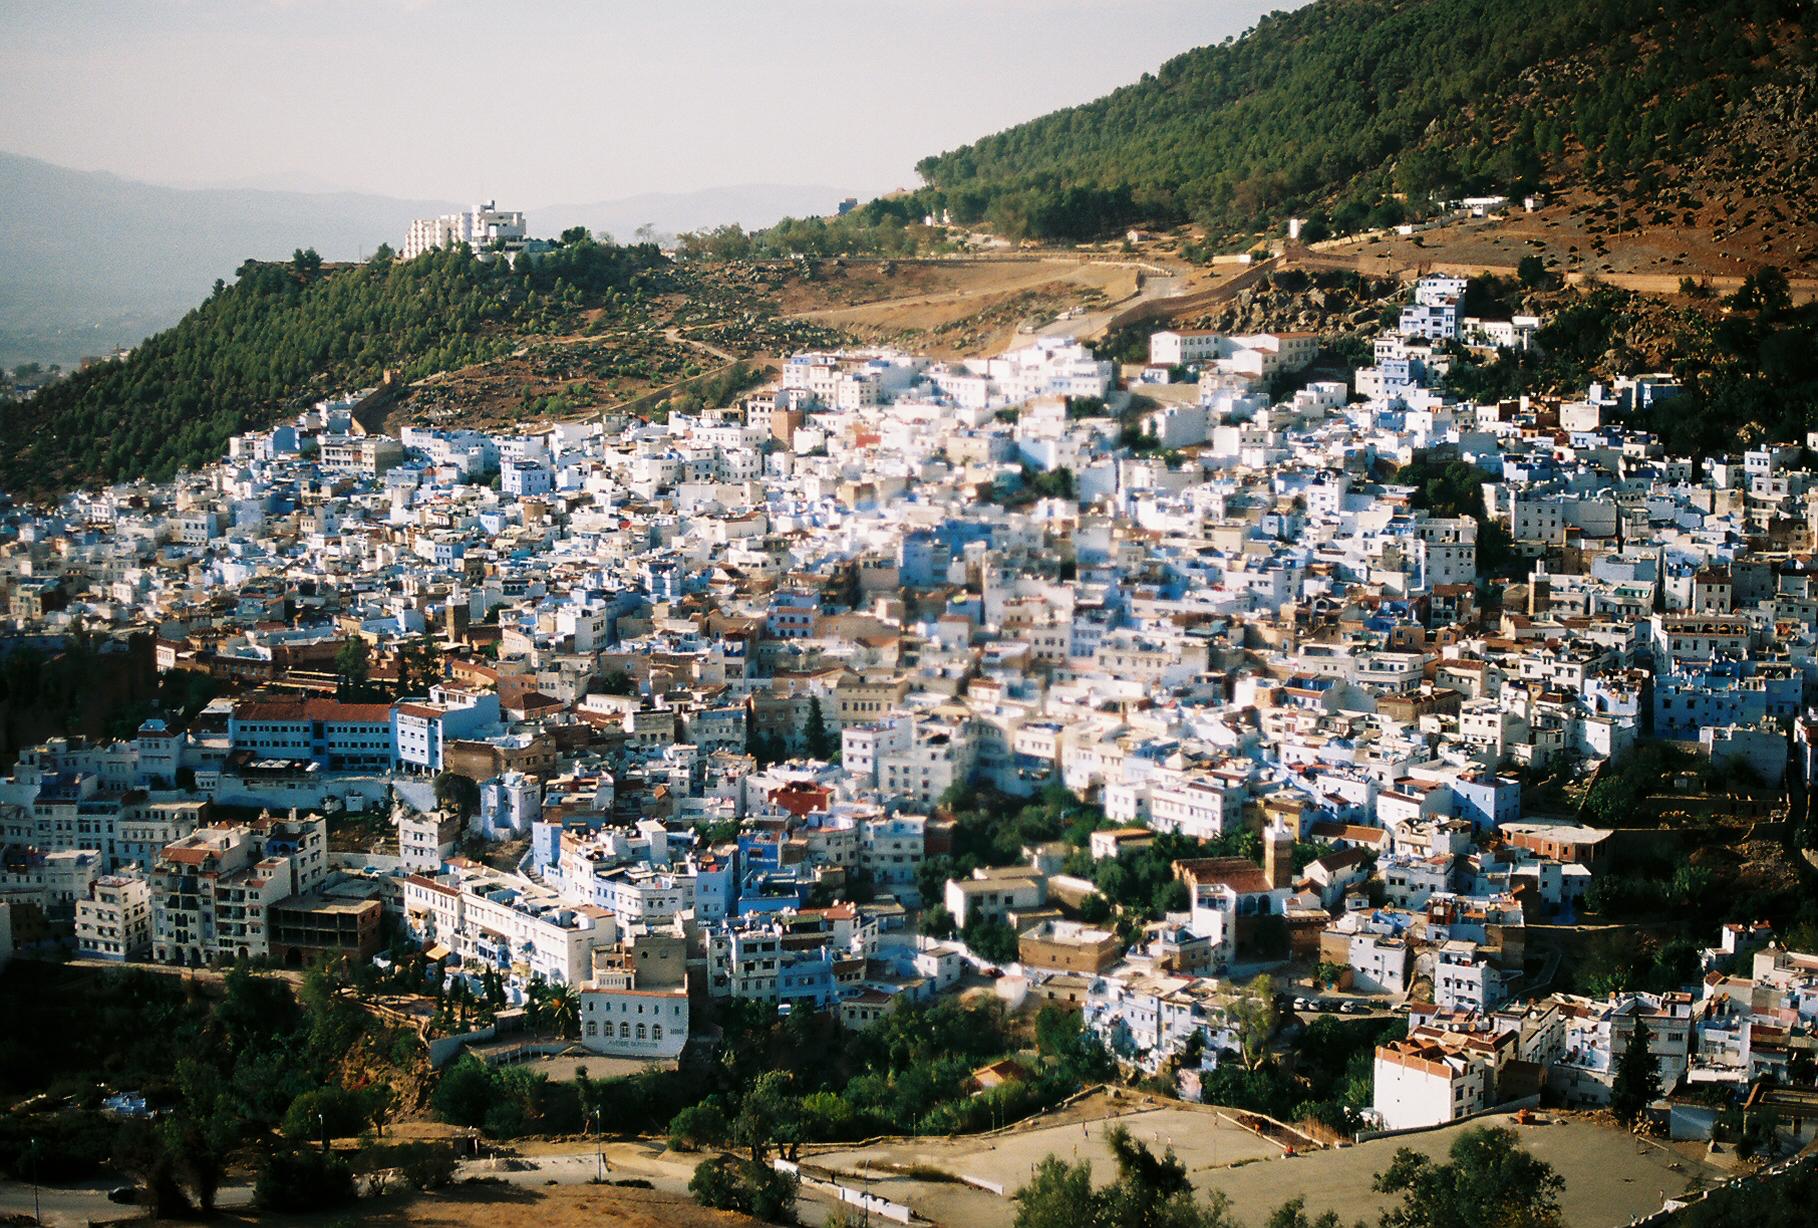 TCBH_Morocco_04.jpg